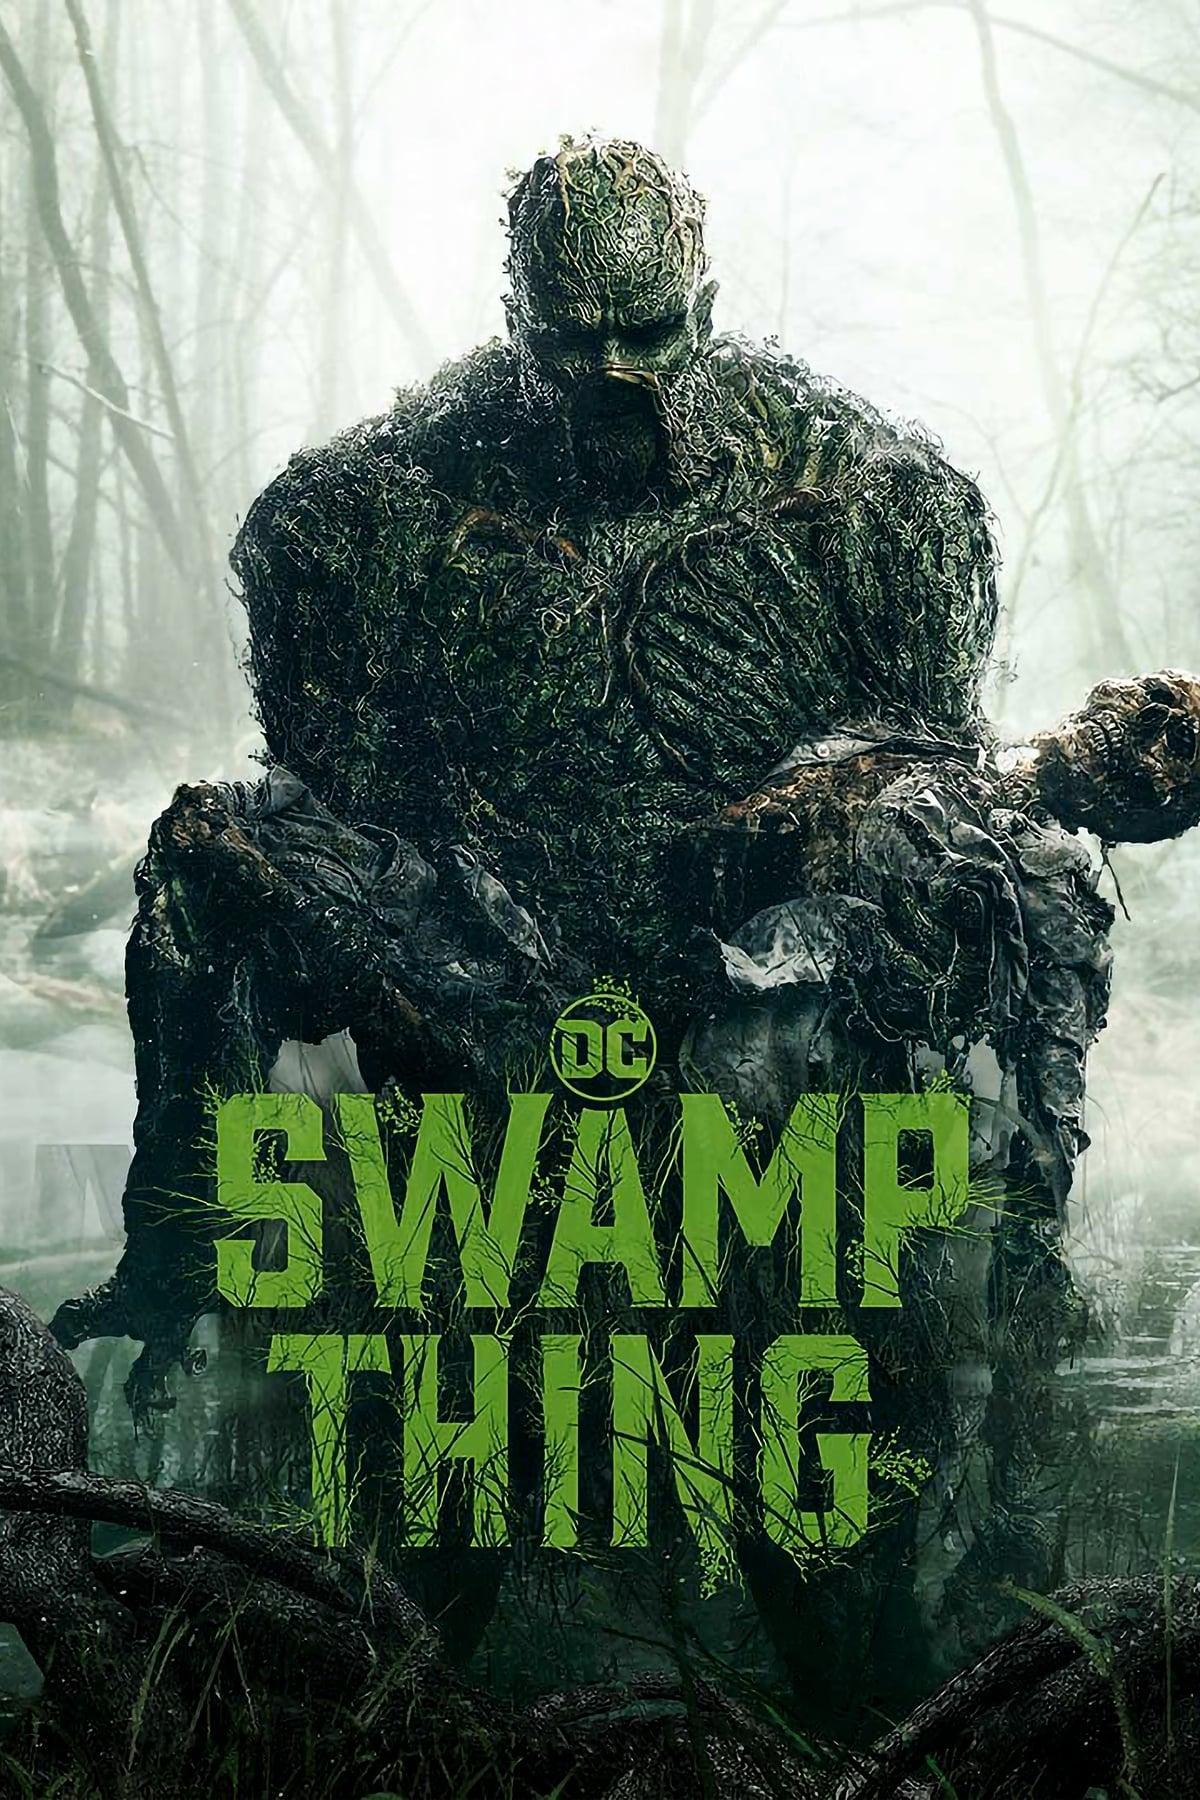 Swamp Thing EP9 (2019) Sub Indo